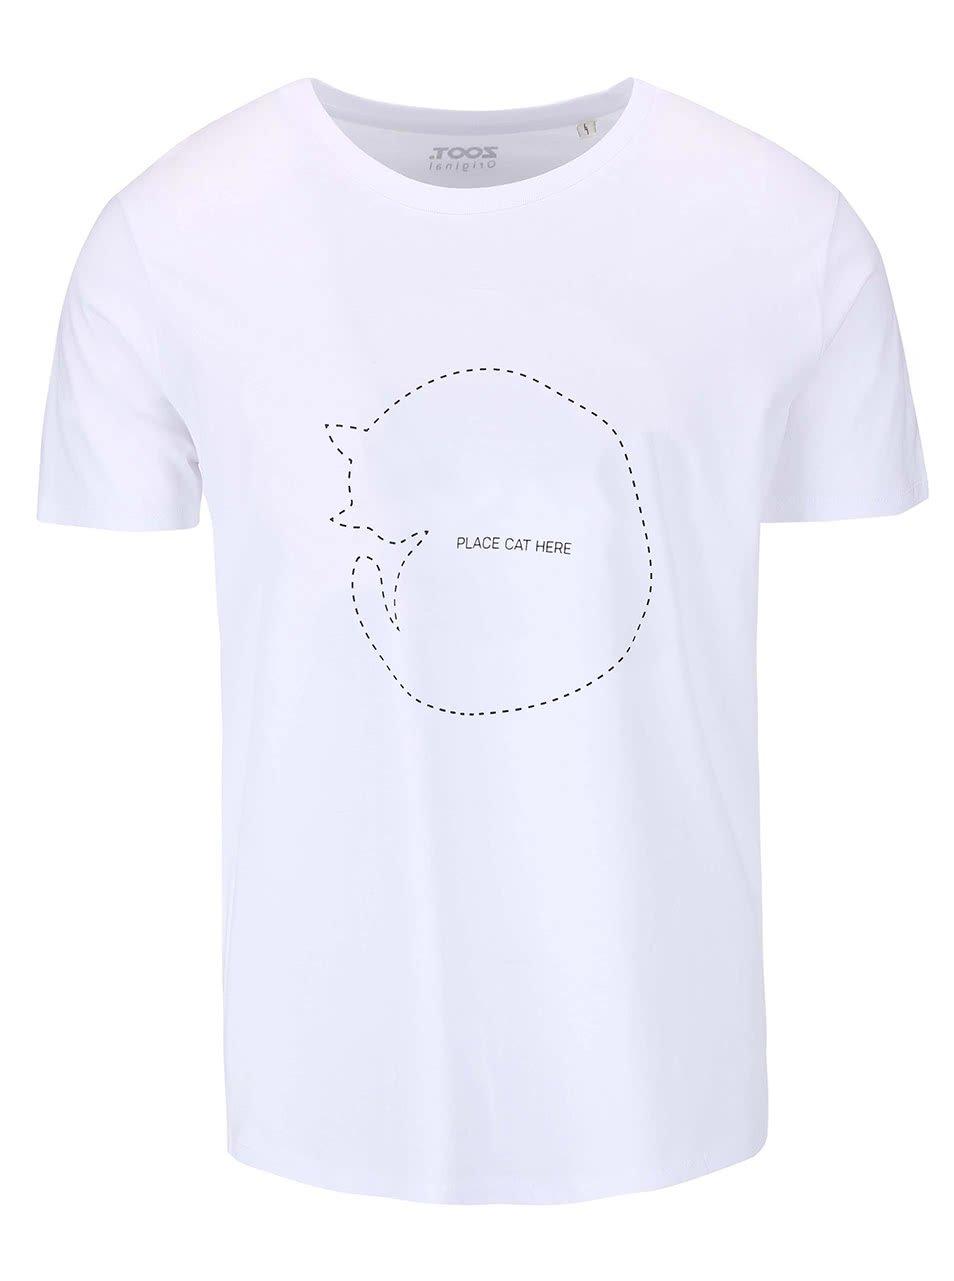 Biele pánske tričko ZOOT Originál Place Cat Here